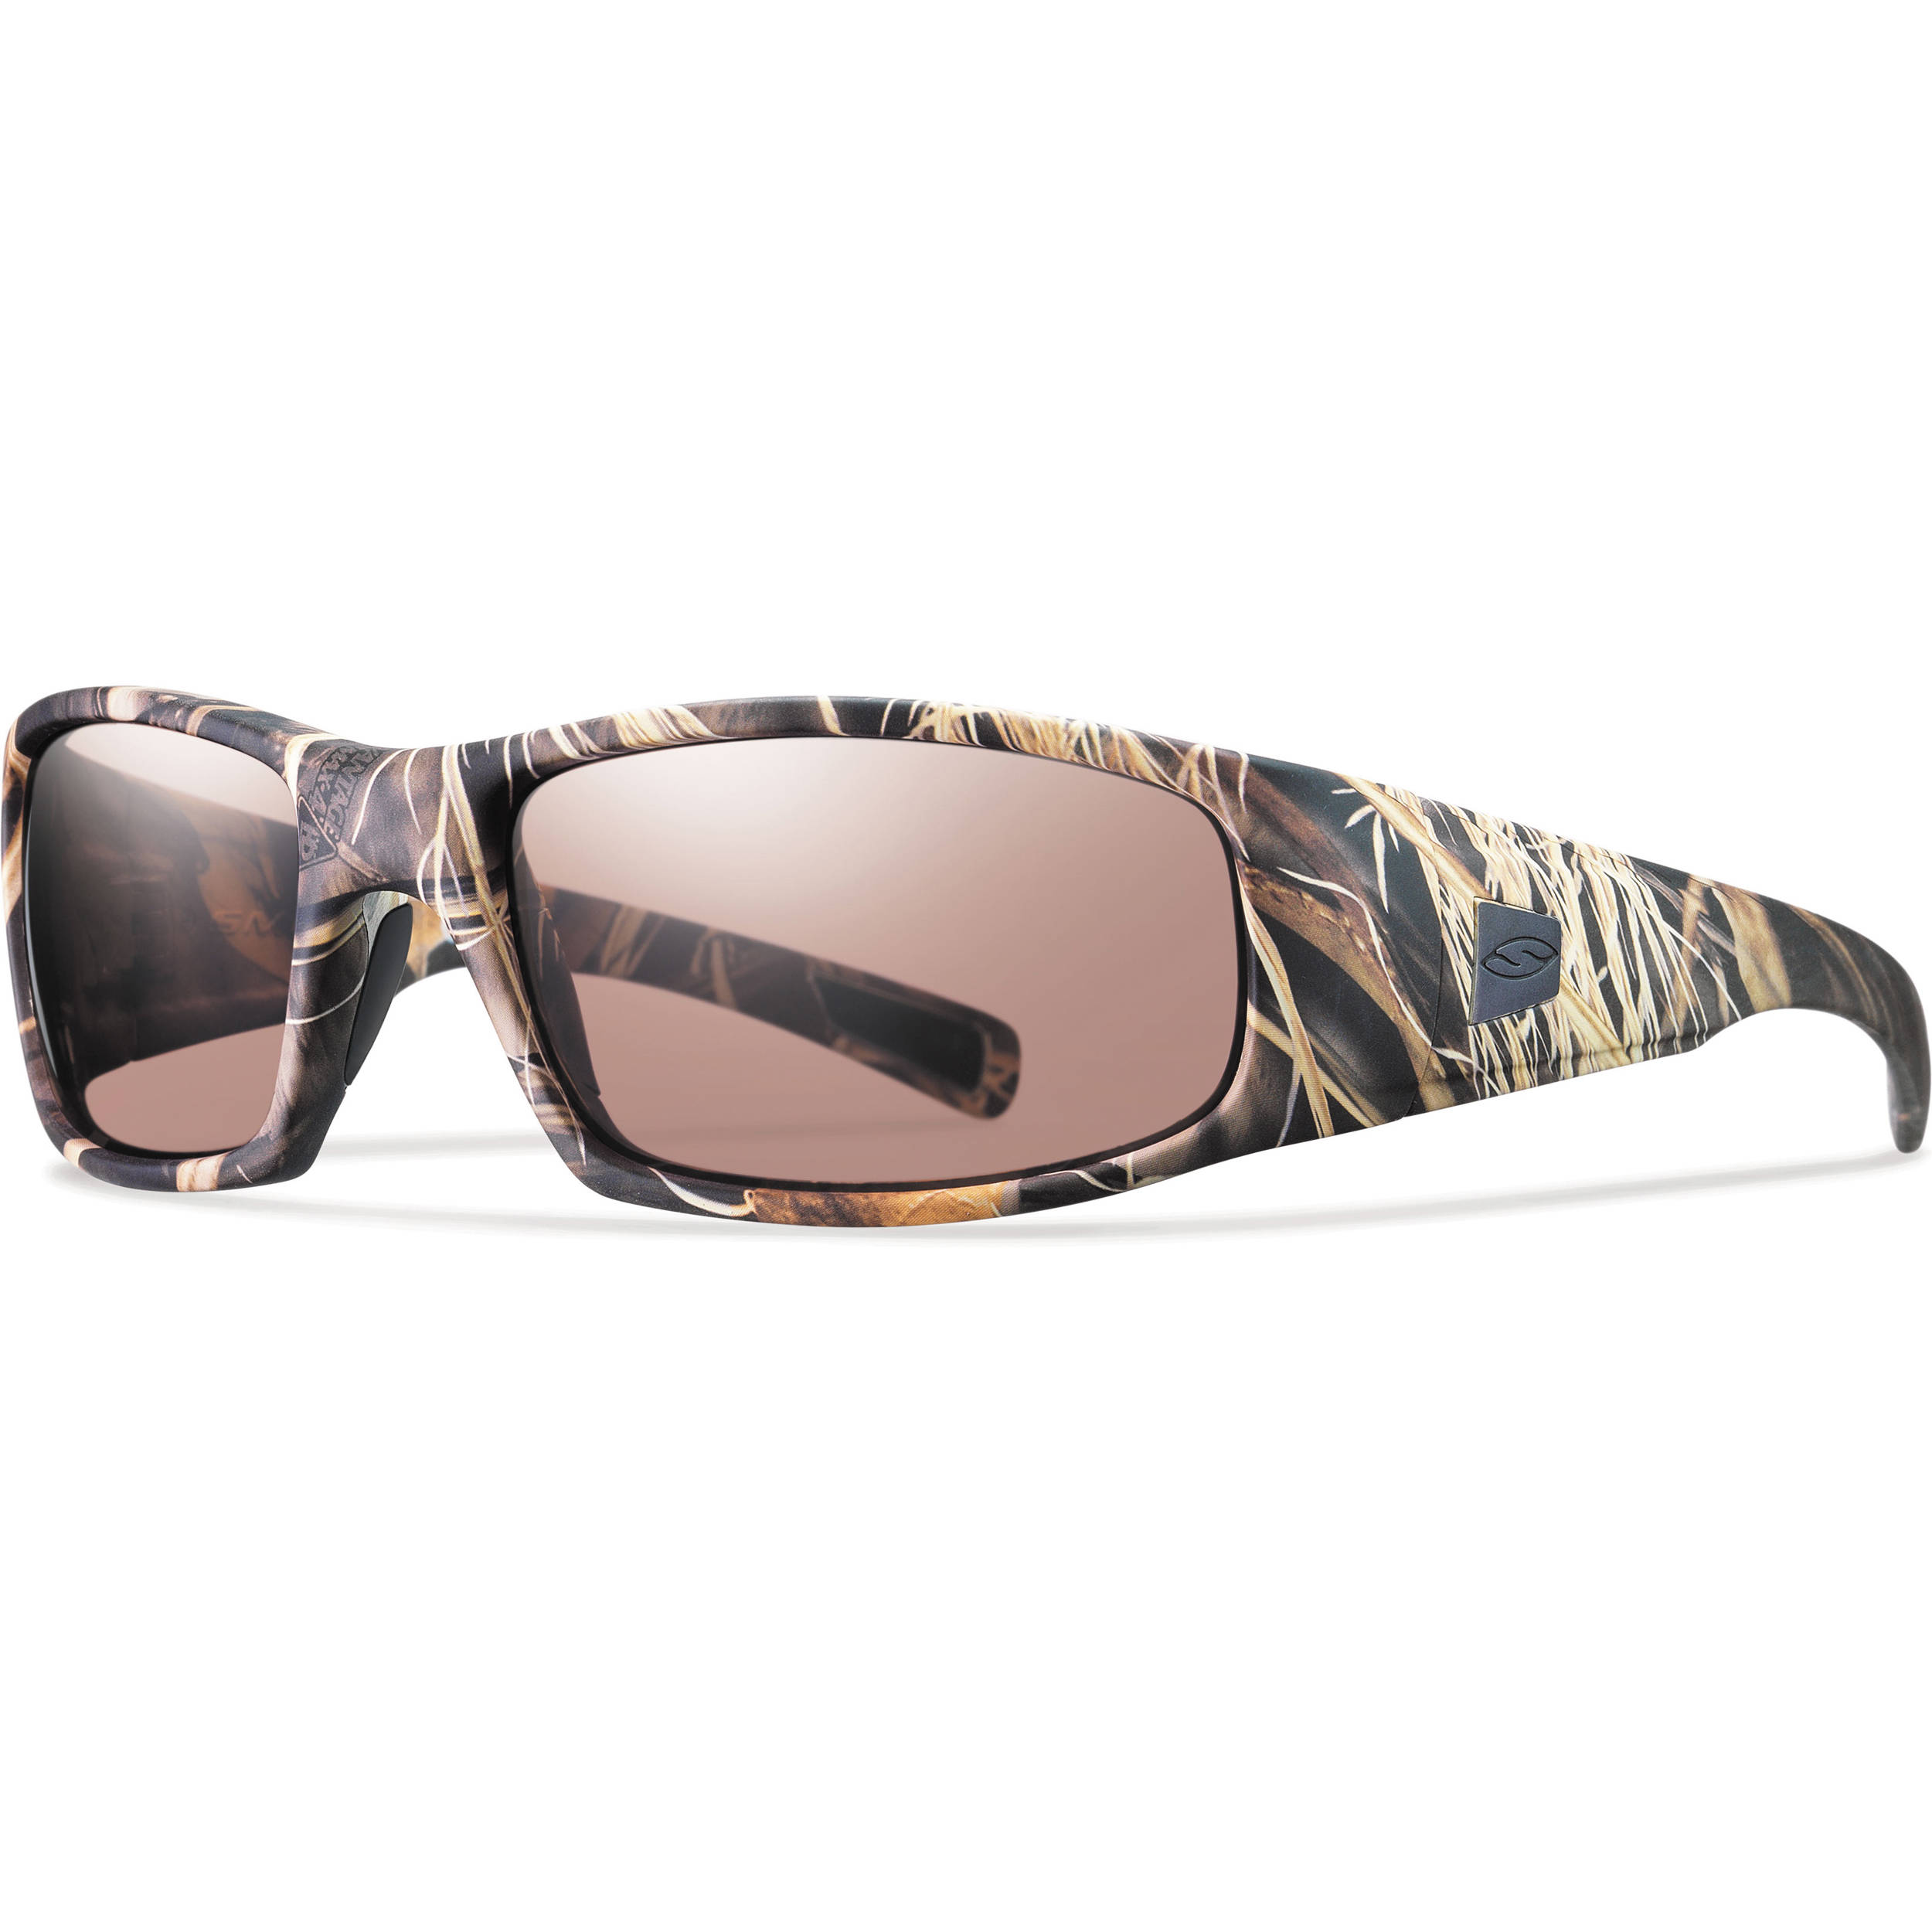 d2dd12f82b Smith Optics Hideout Elite Tactical Sunglasses (Realtree Max-4 - Ignitor  Mirror Lens)